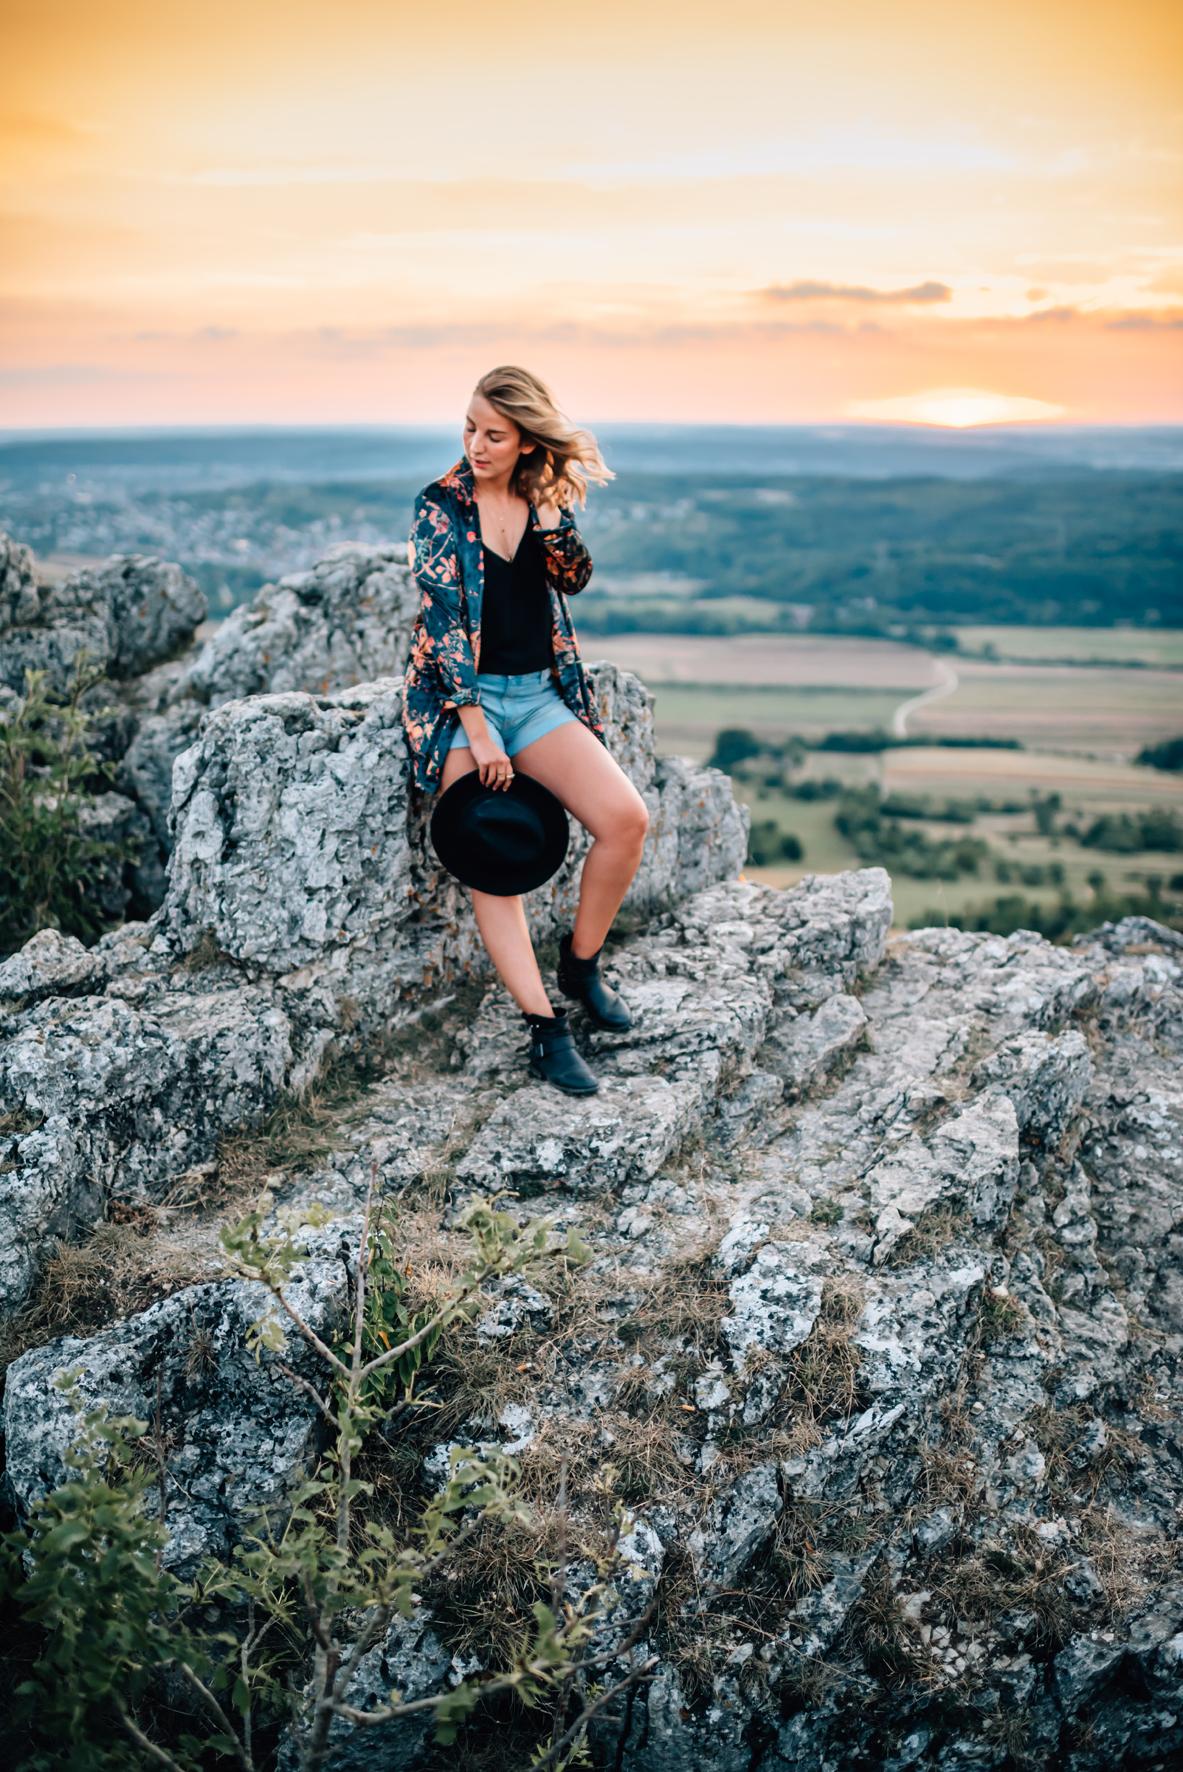 Outdoorfotografie Berge